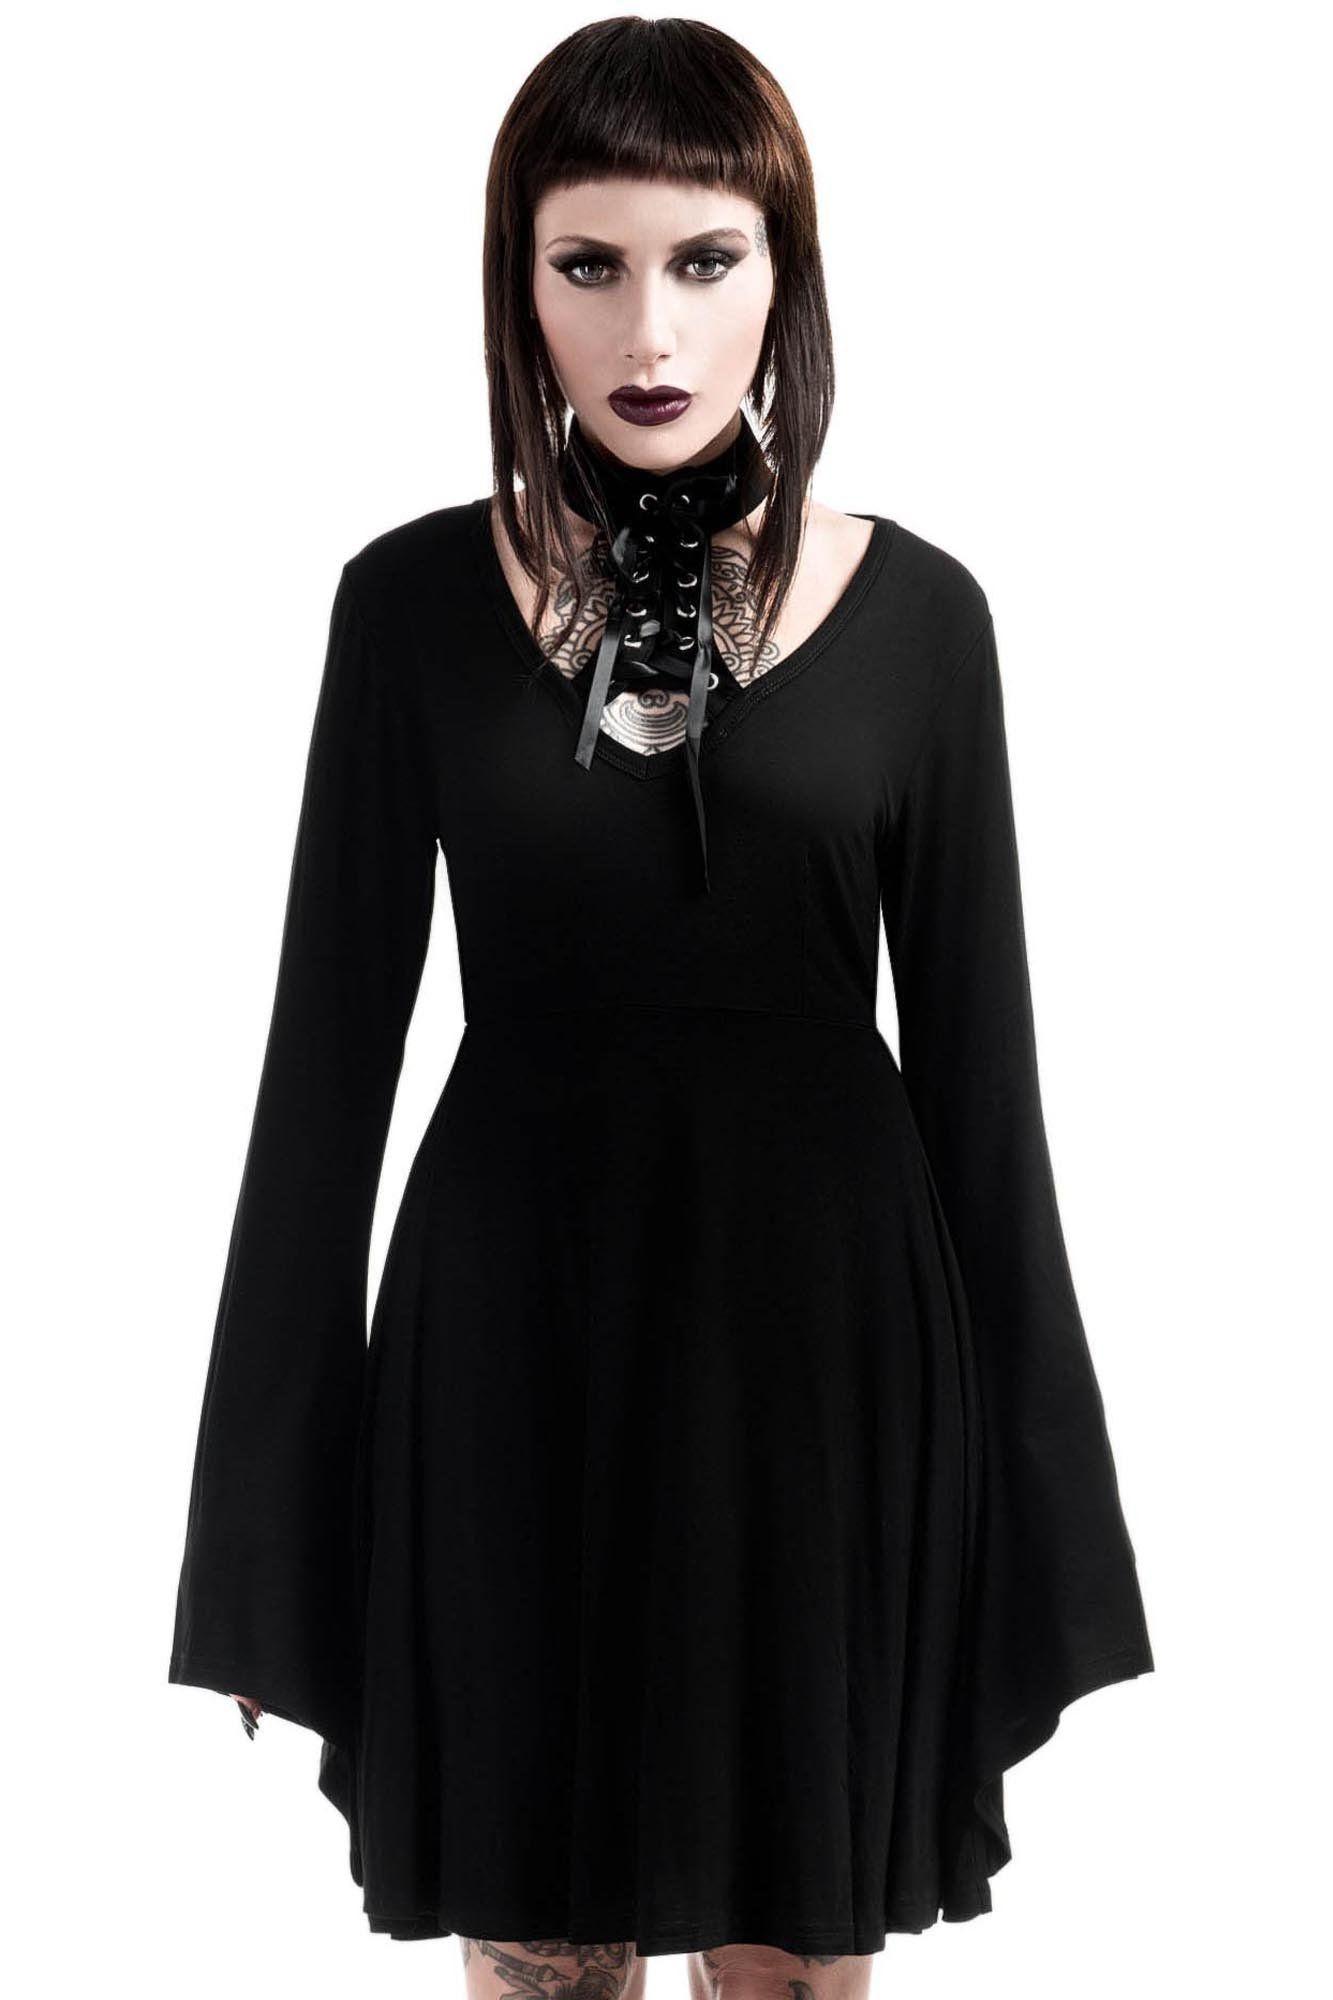 ks2618_mini-robe_gothique_glam_rock_spyda-lace-me_1